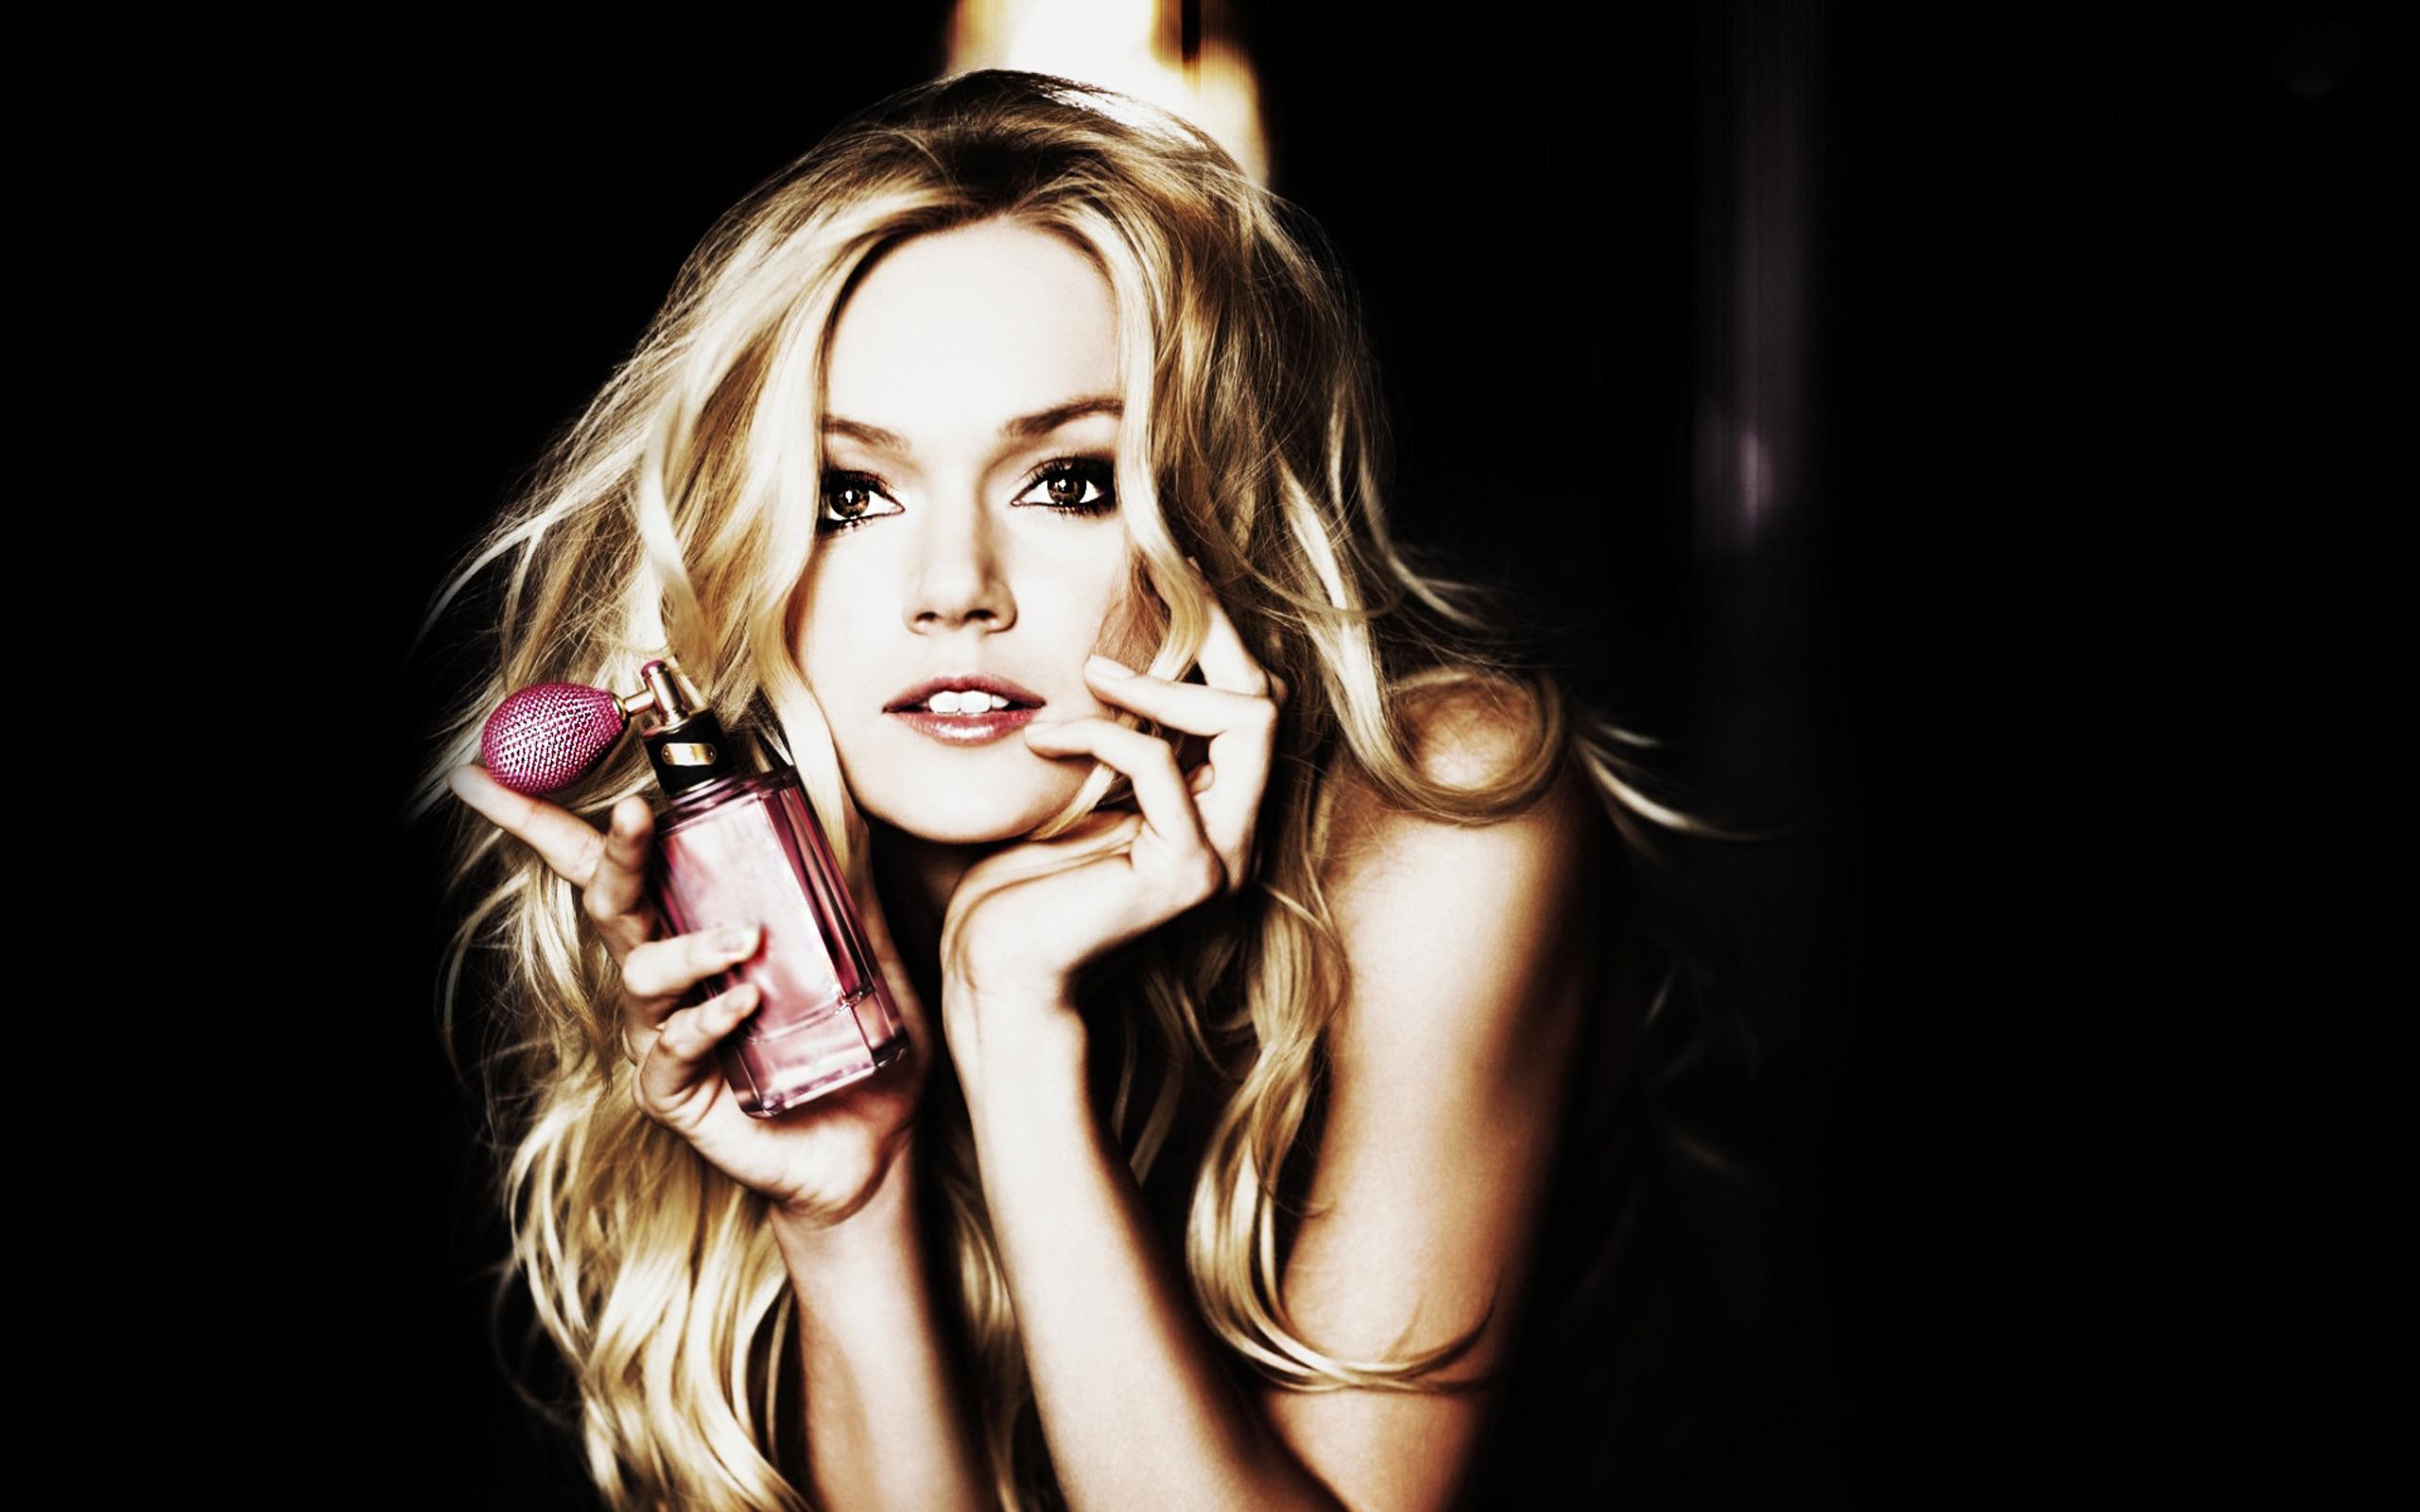 Lindsay Ellingson Hd Wallpaper Background Image 2560x1600 Id